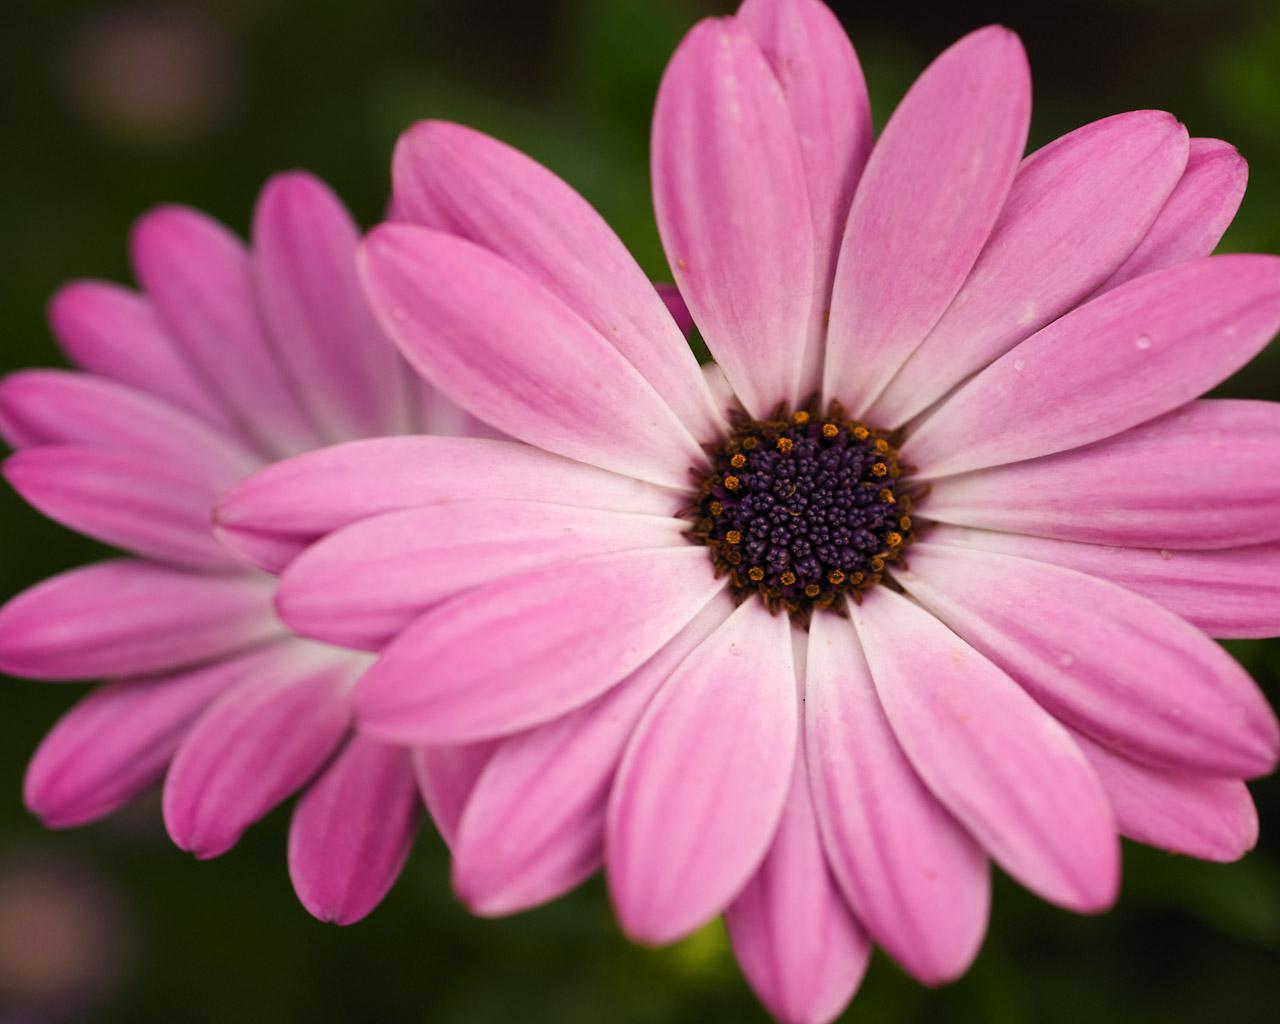 pink flower wallpaper,flower,flowering plant,petal,barberton daisy,african daisy